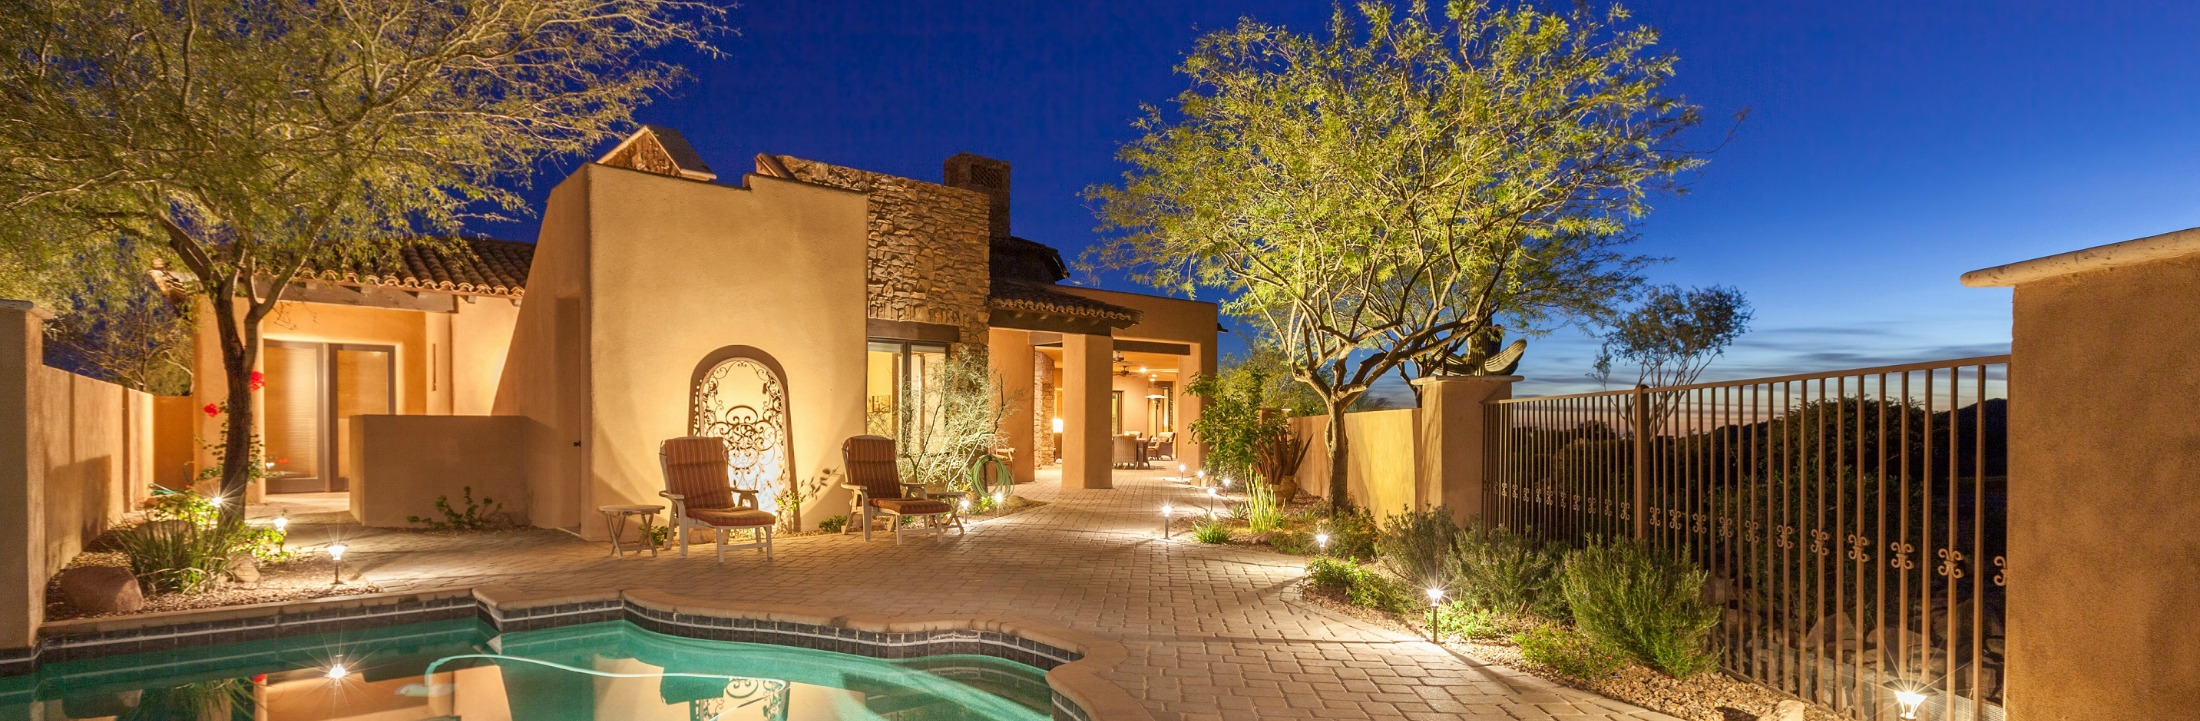 Southern Utah Real Estate | Washington County Homes